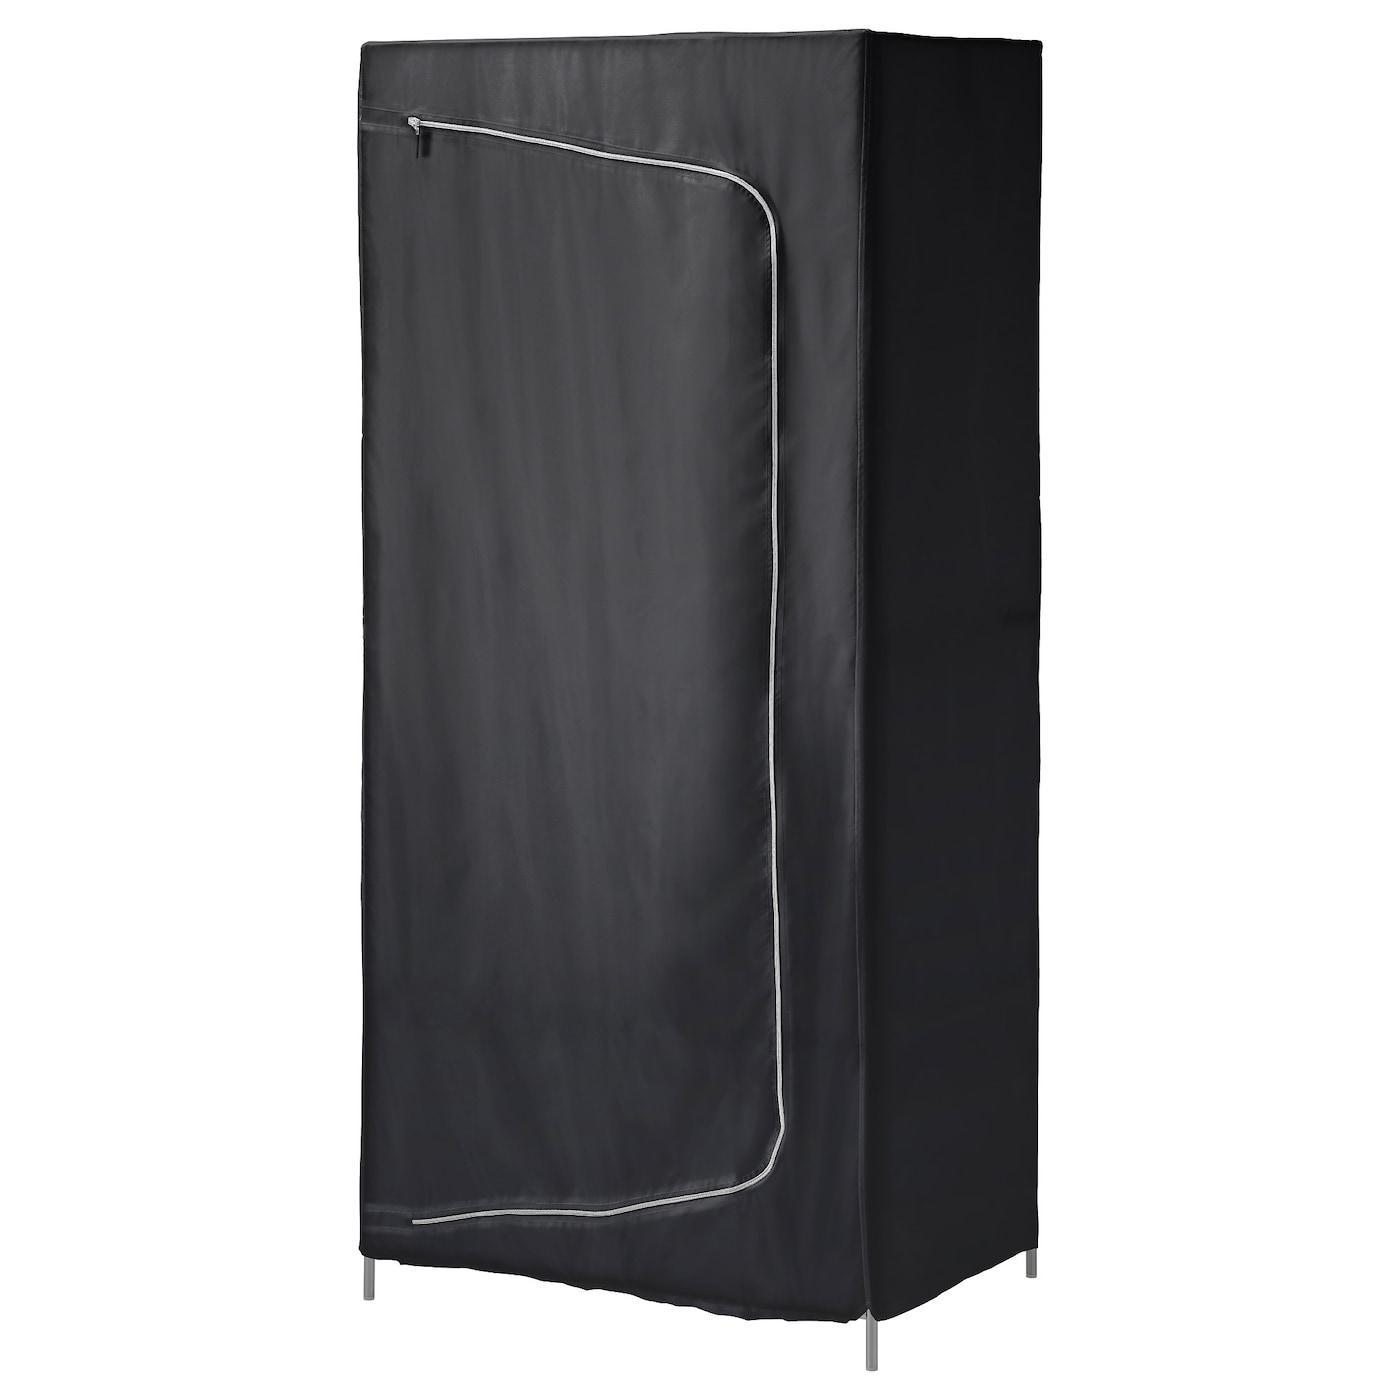 breim armoire penderie noir 80x55x180 cm ikea. Black Bedroom Furniture Sets. Home Design Ideas